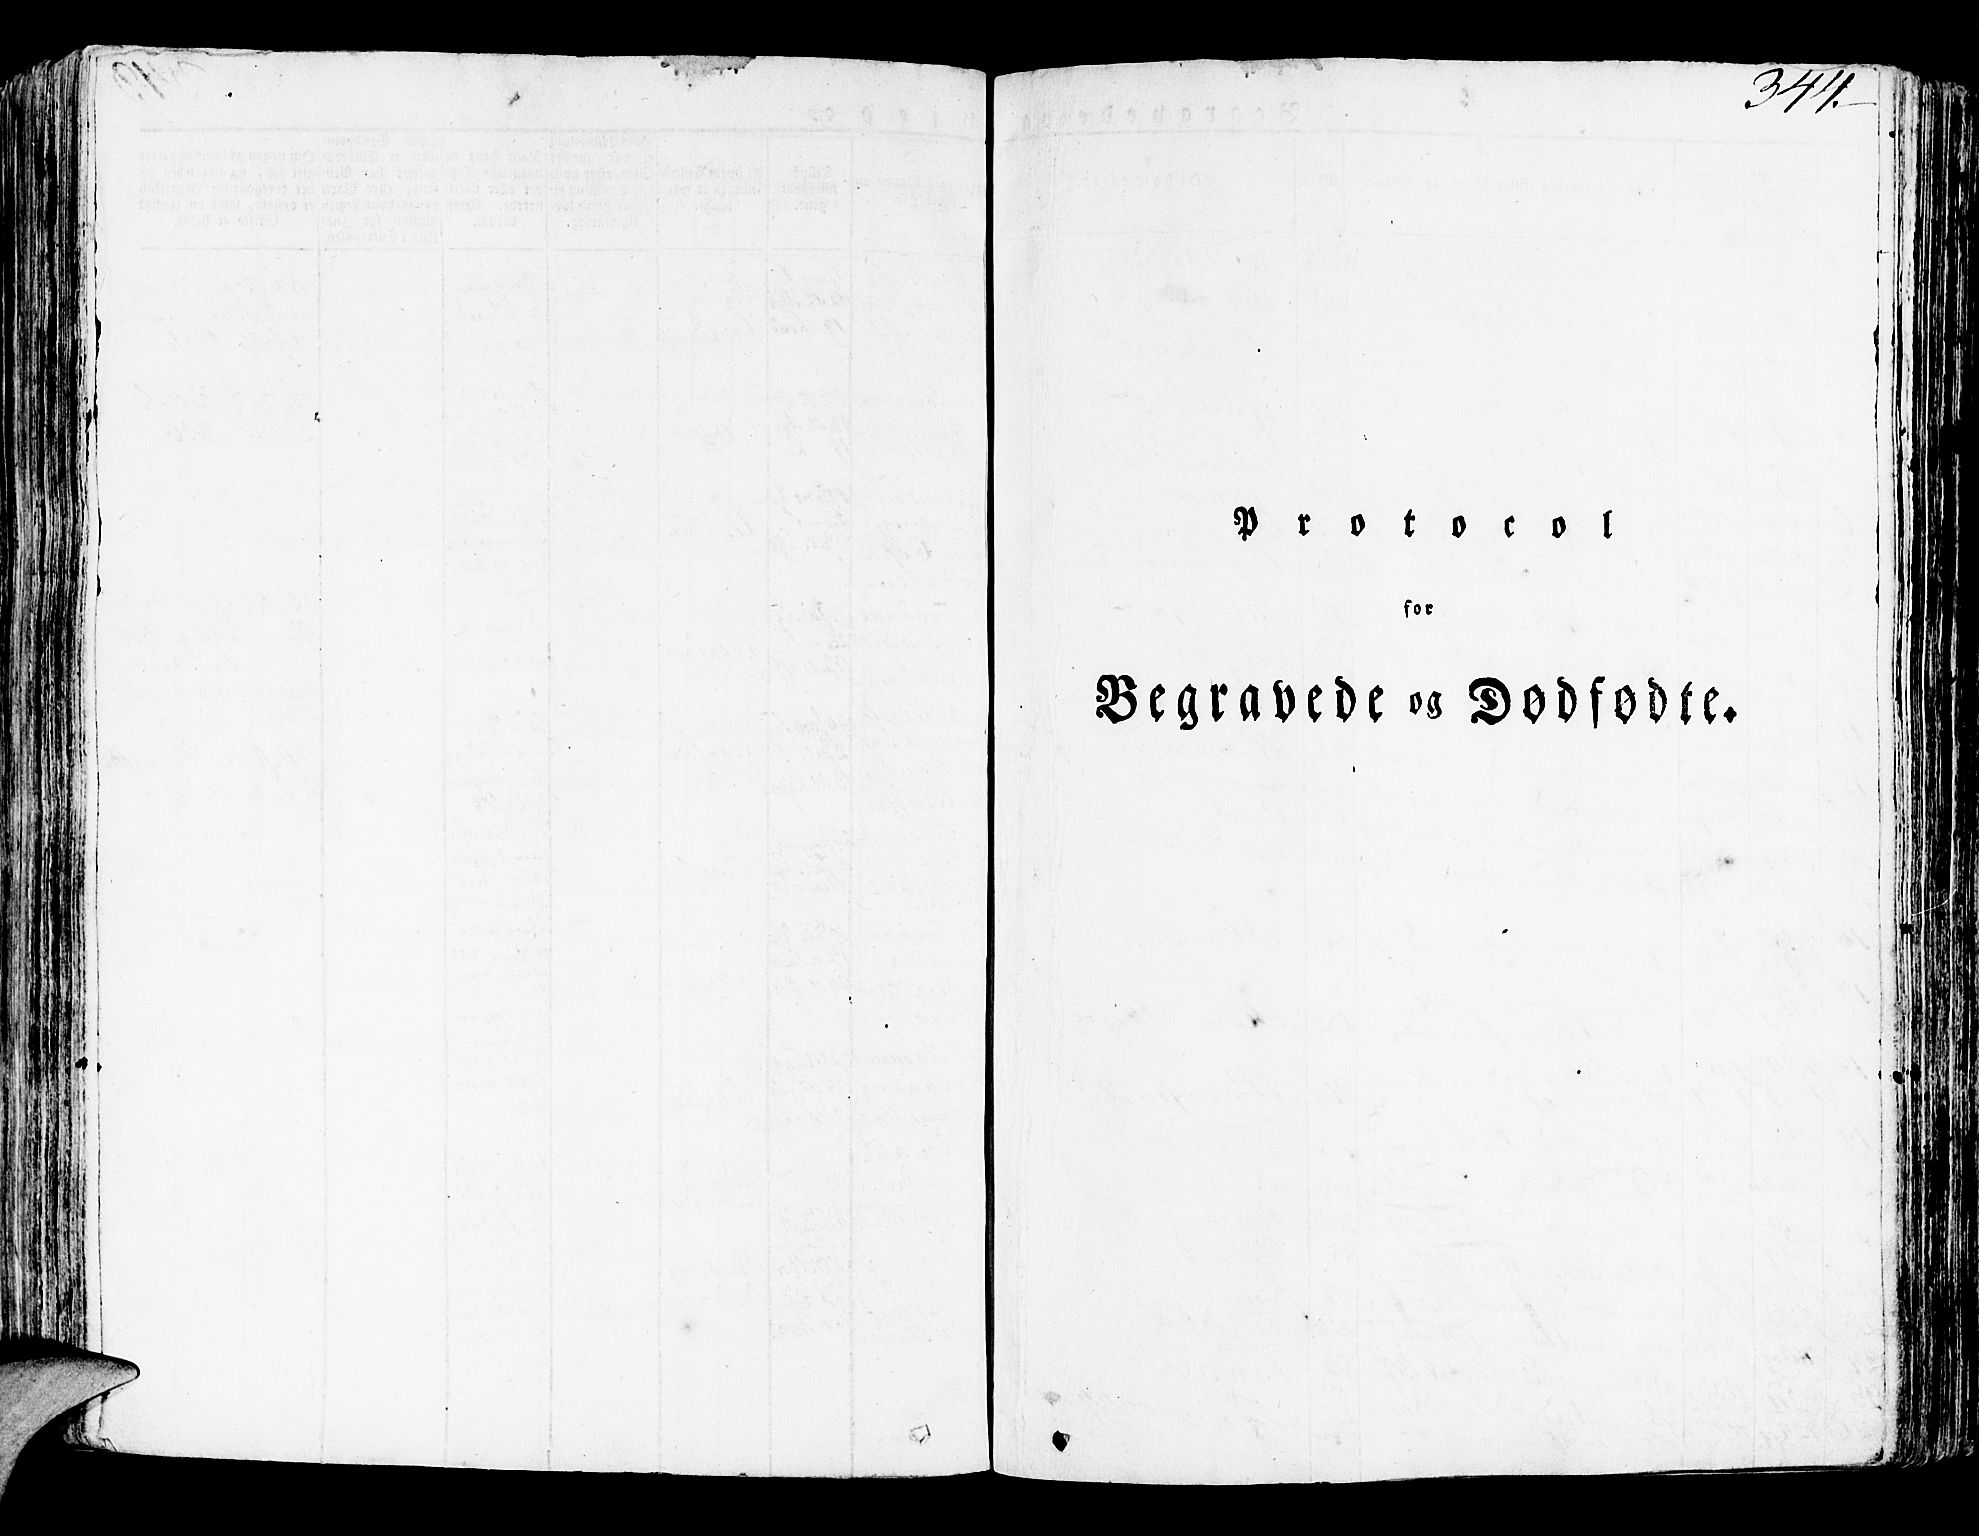 SAB, Lindås Sokneprestembete, H/Haa: Ministerialbok nr. A 8, 1823-1836, s. 344